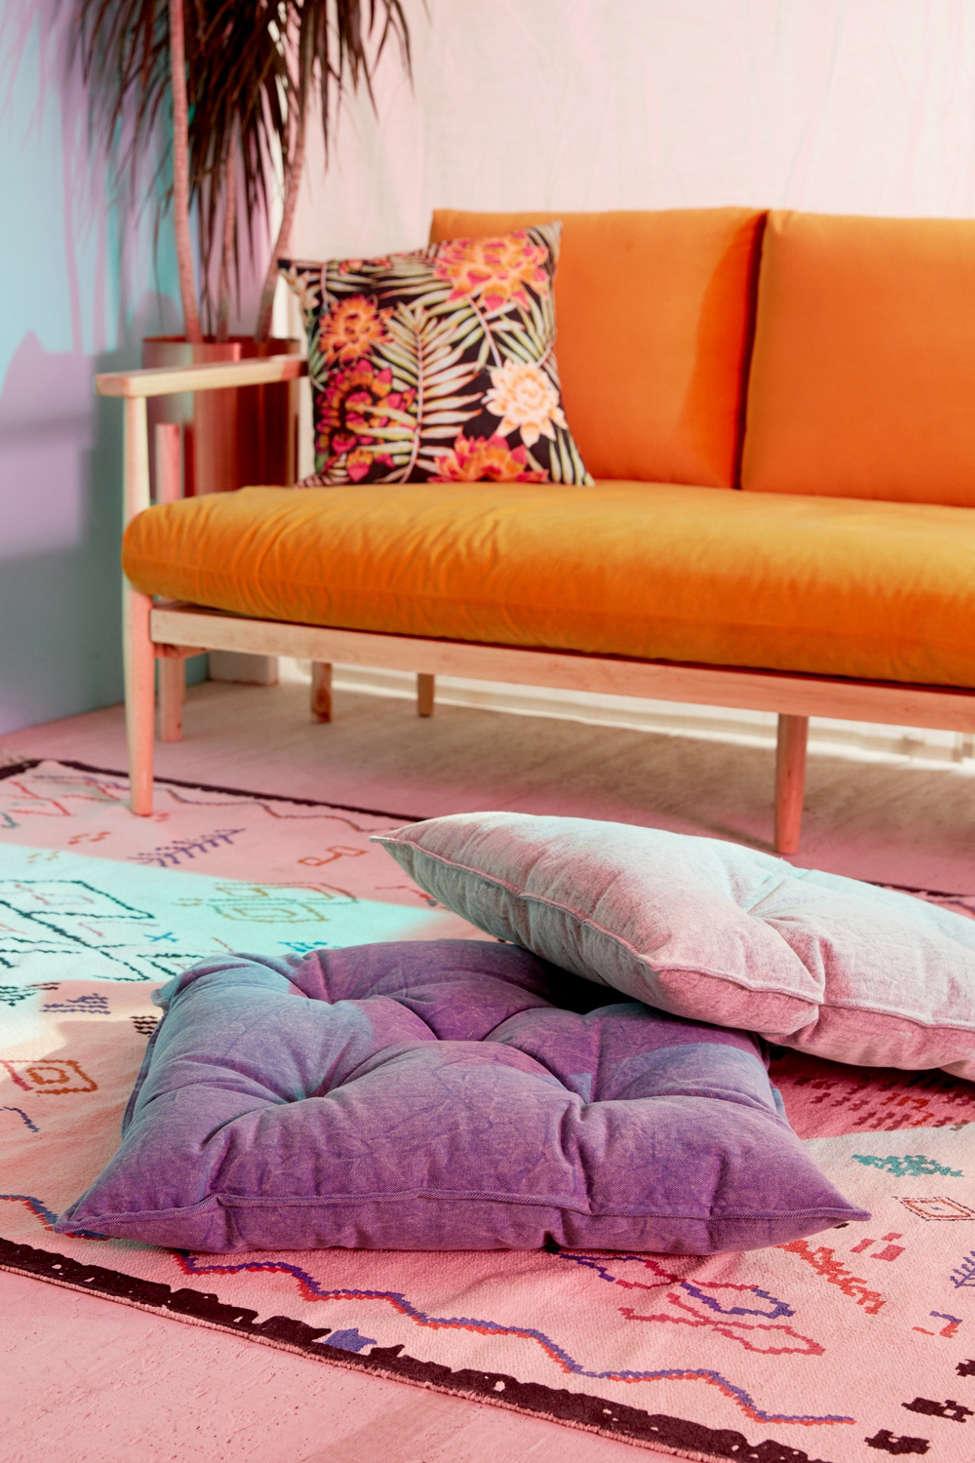 Slide View: 3: Denim Floor Pillow